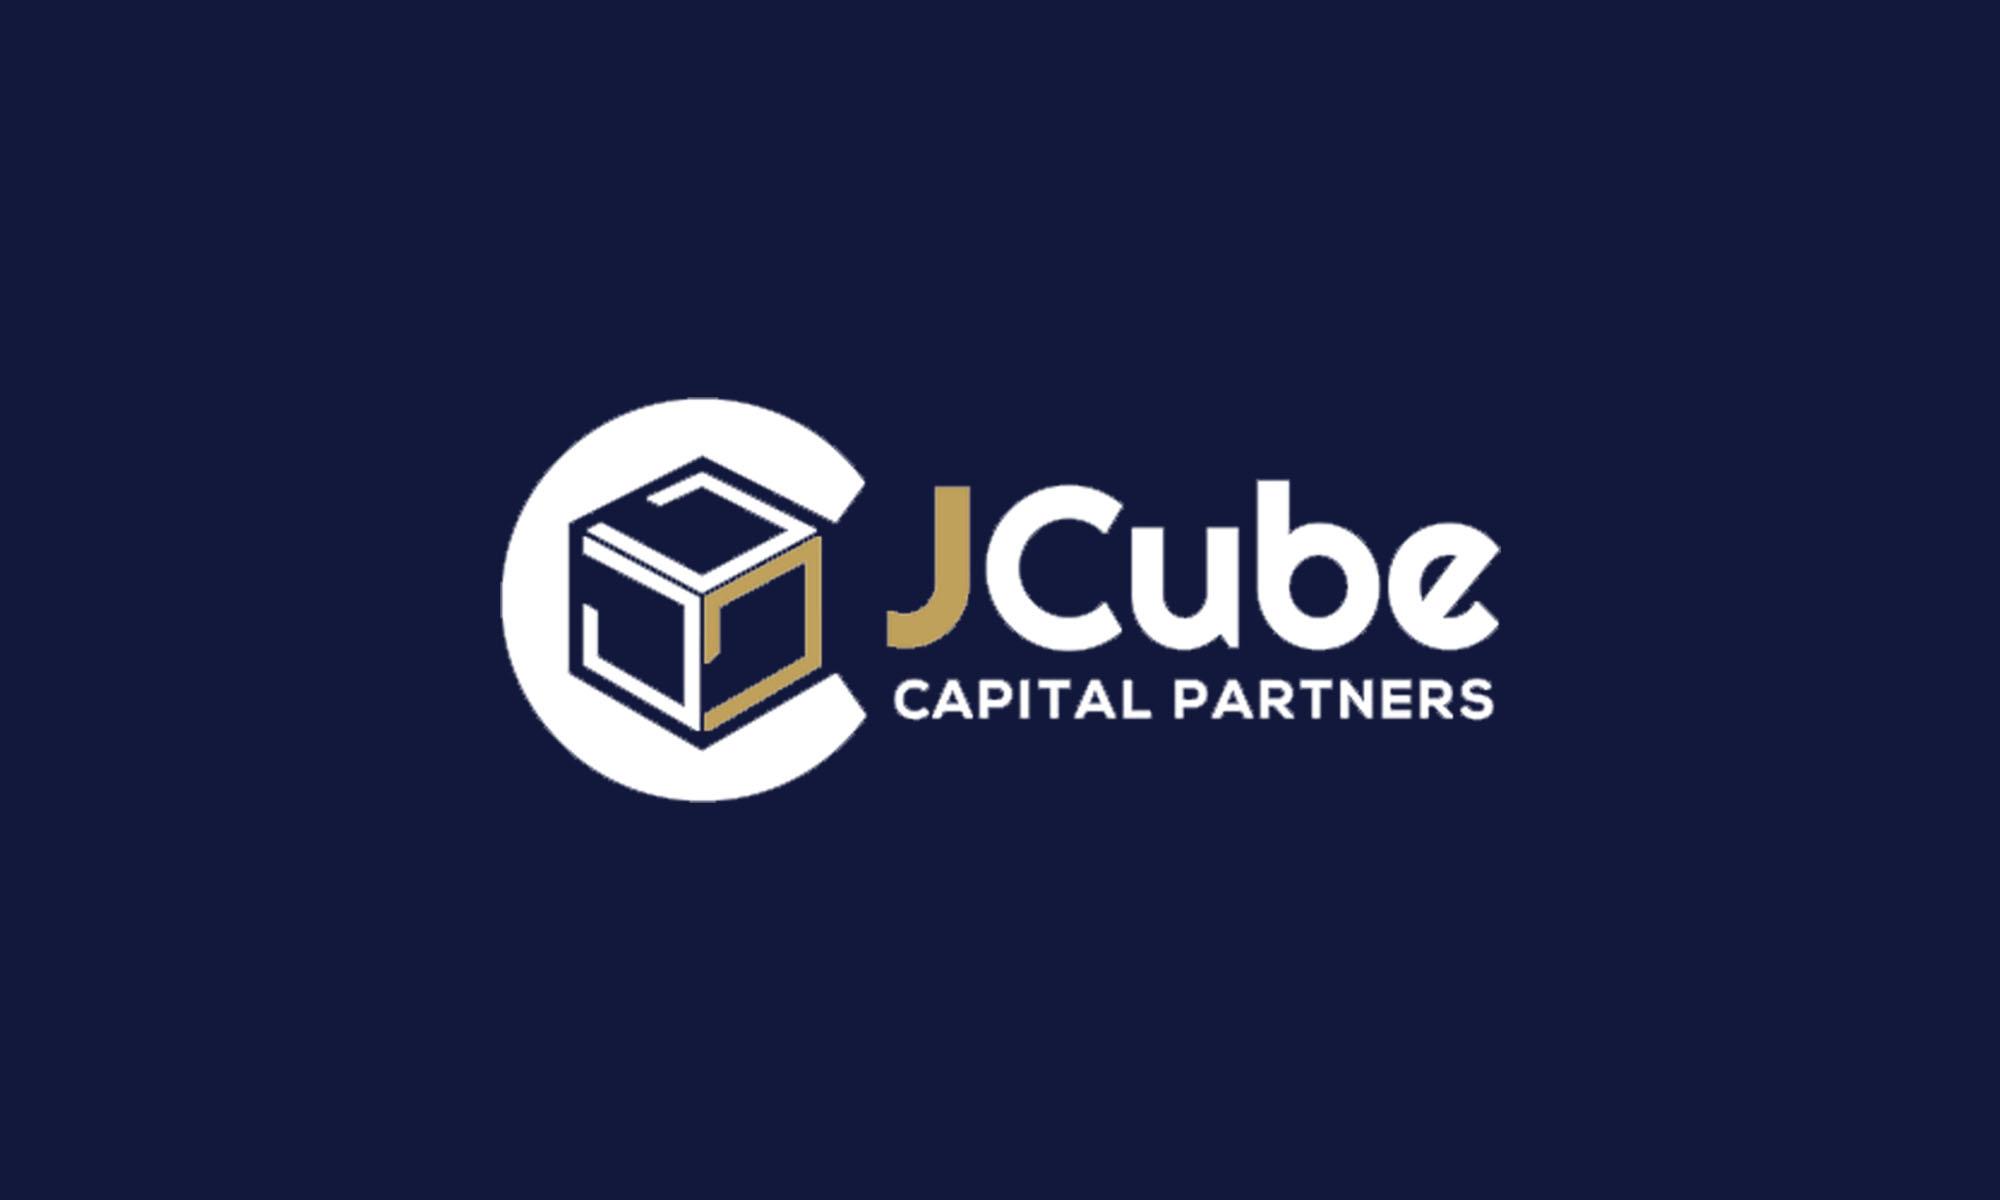 JCube Capital Partners